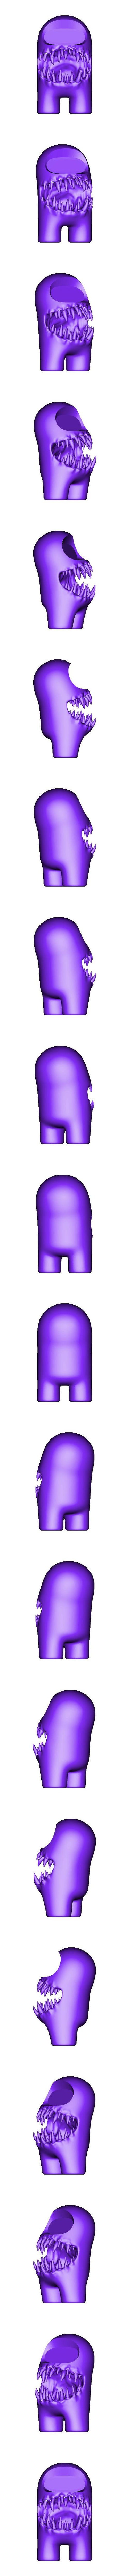 impostBodyFull.obj Download free OBJ file Among Us (easy print)(crew/body/ghost/impostor) • 3D printable template, devanborkhatria